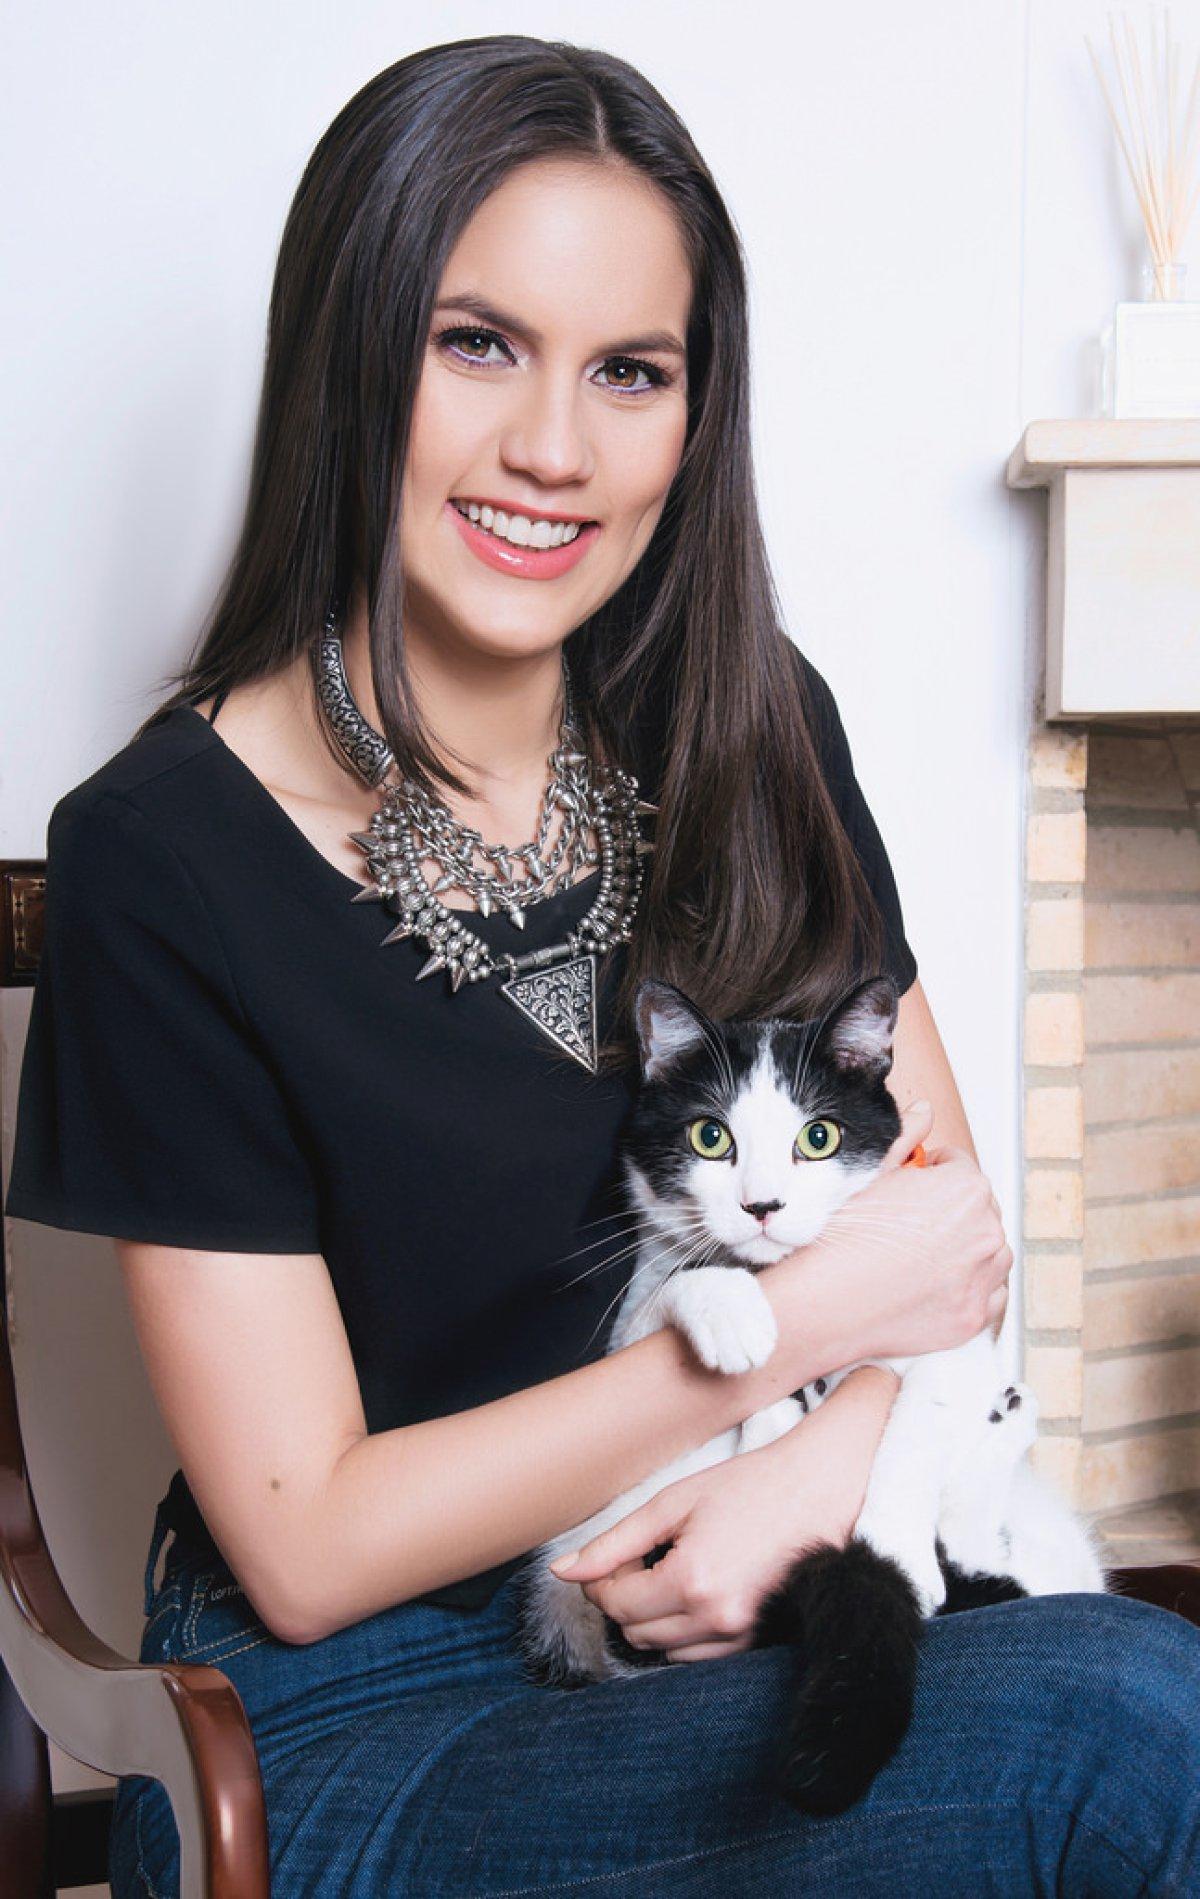 La terrible fobia de Linda Palma que no la deja vivir en paz